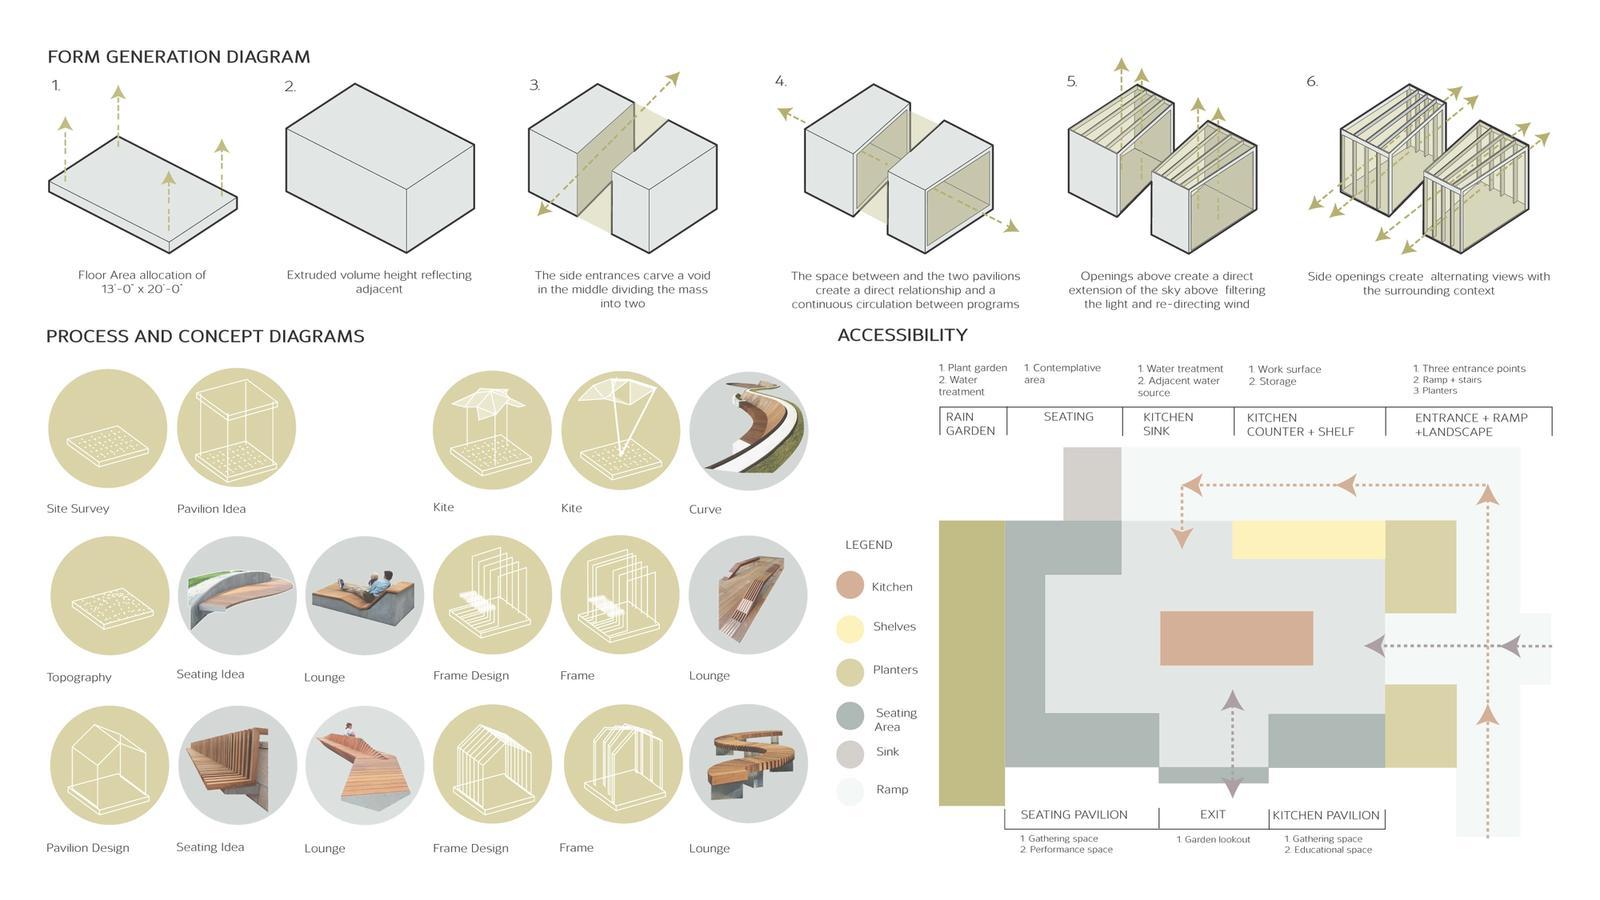 Form Generation Diagram, Process diagram and accessibility diagram